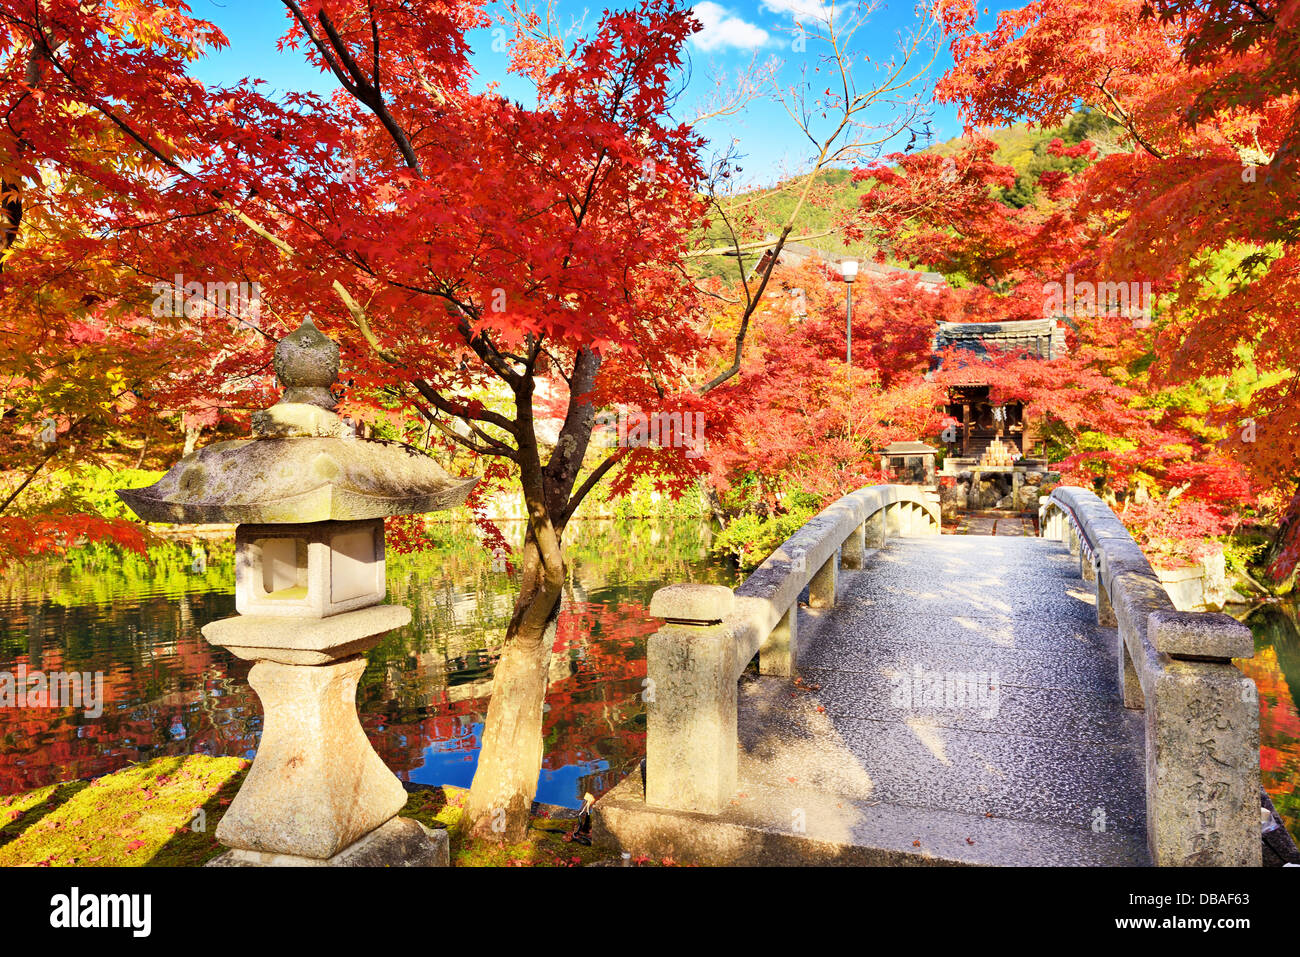 Fall foliage at Eikando Temple in Kyoto, Japan. 11/19 - Stock Image